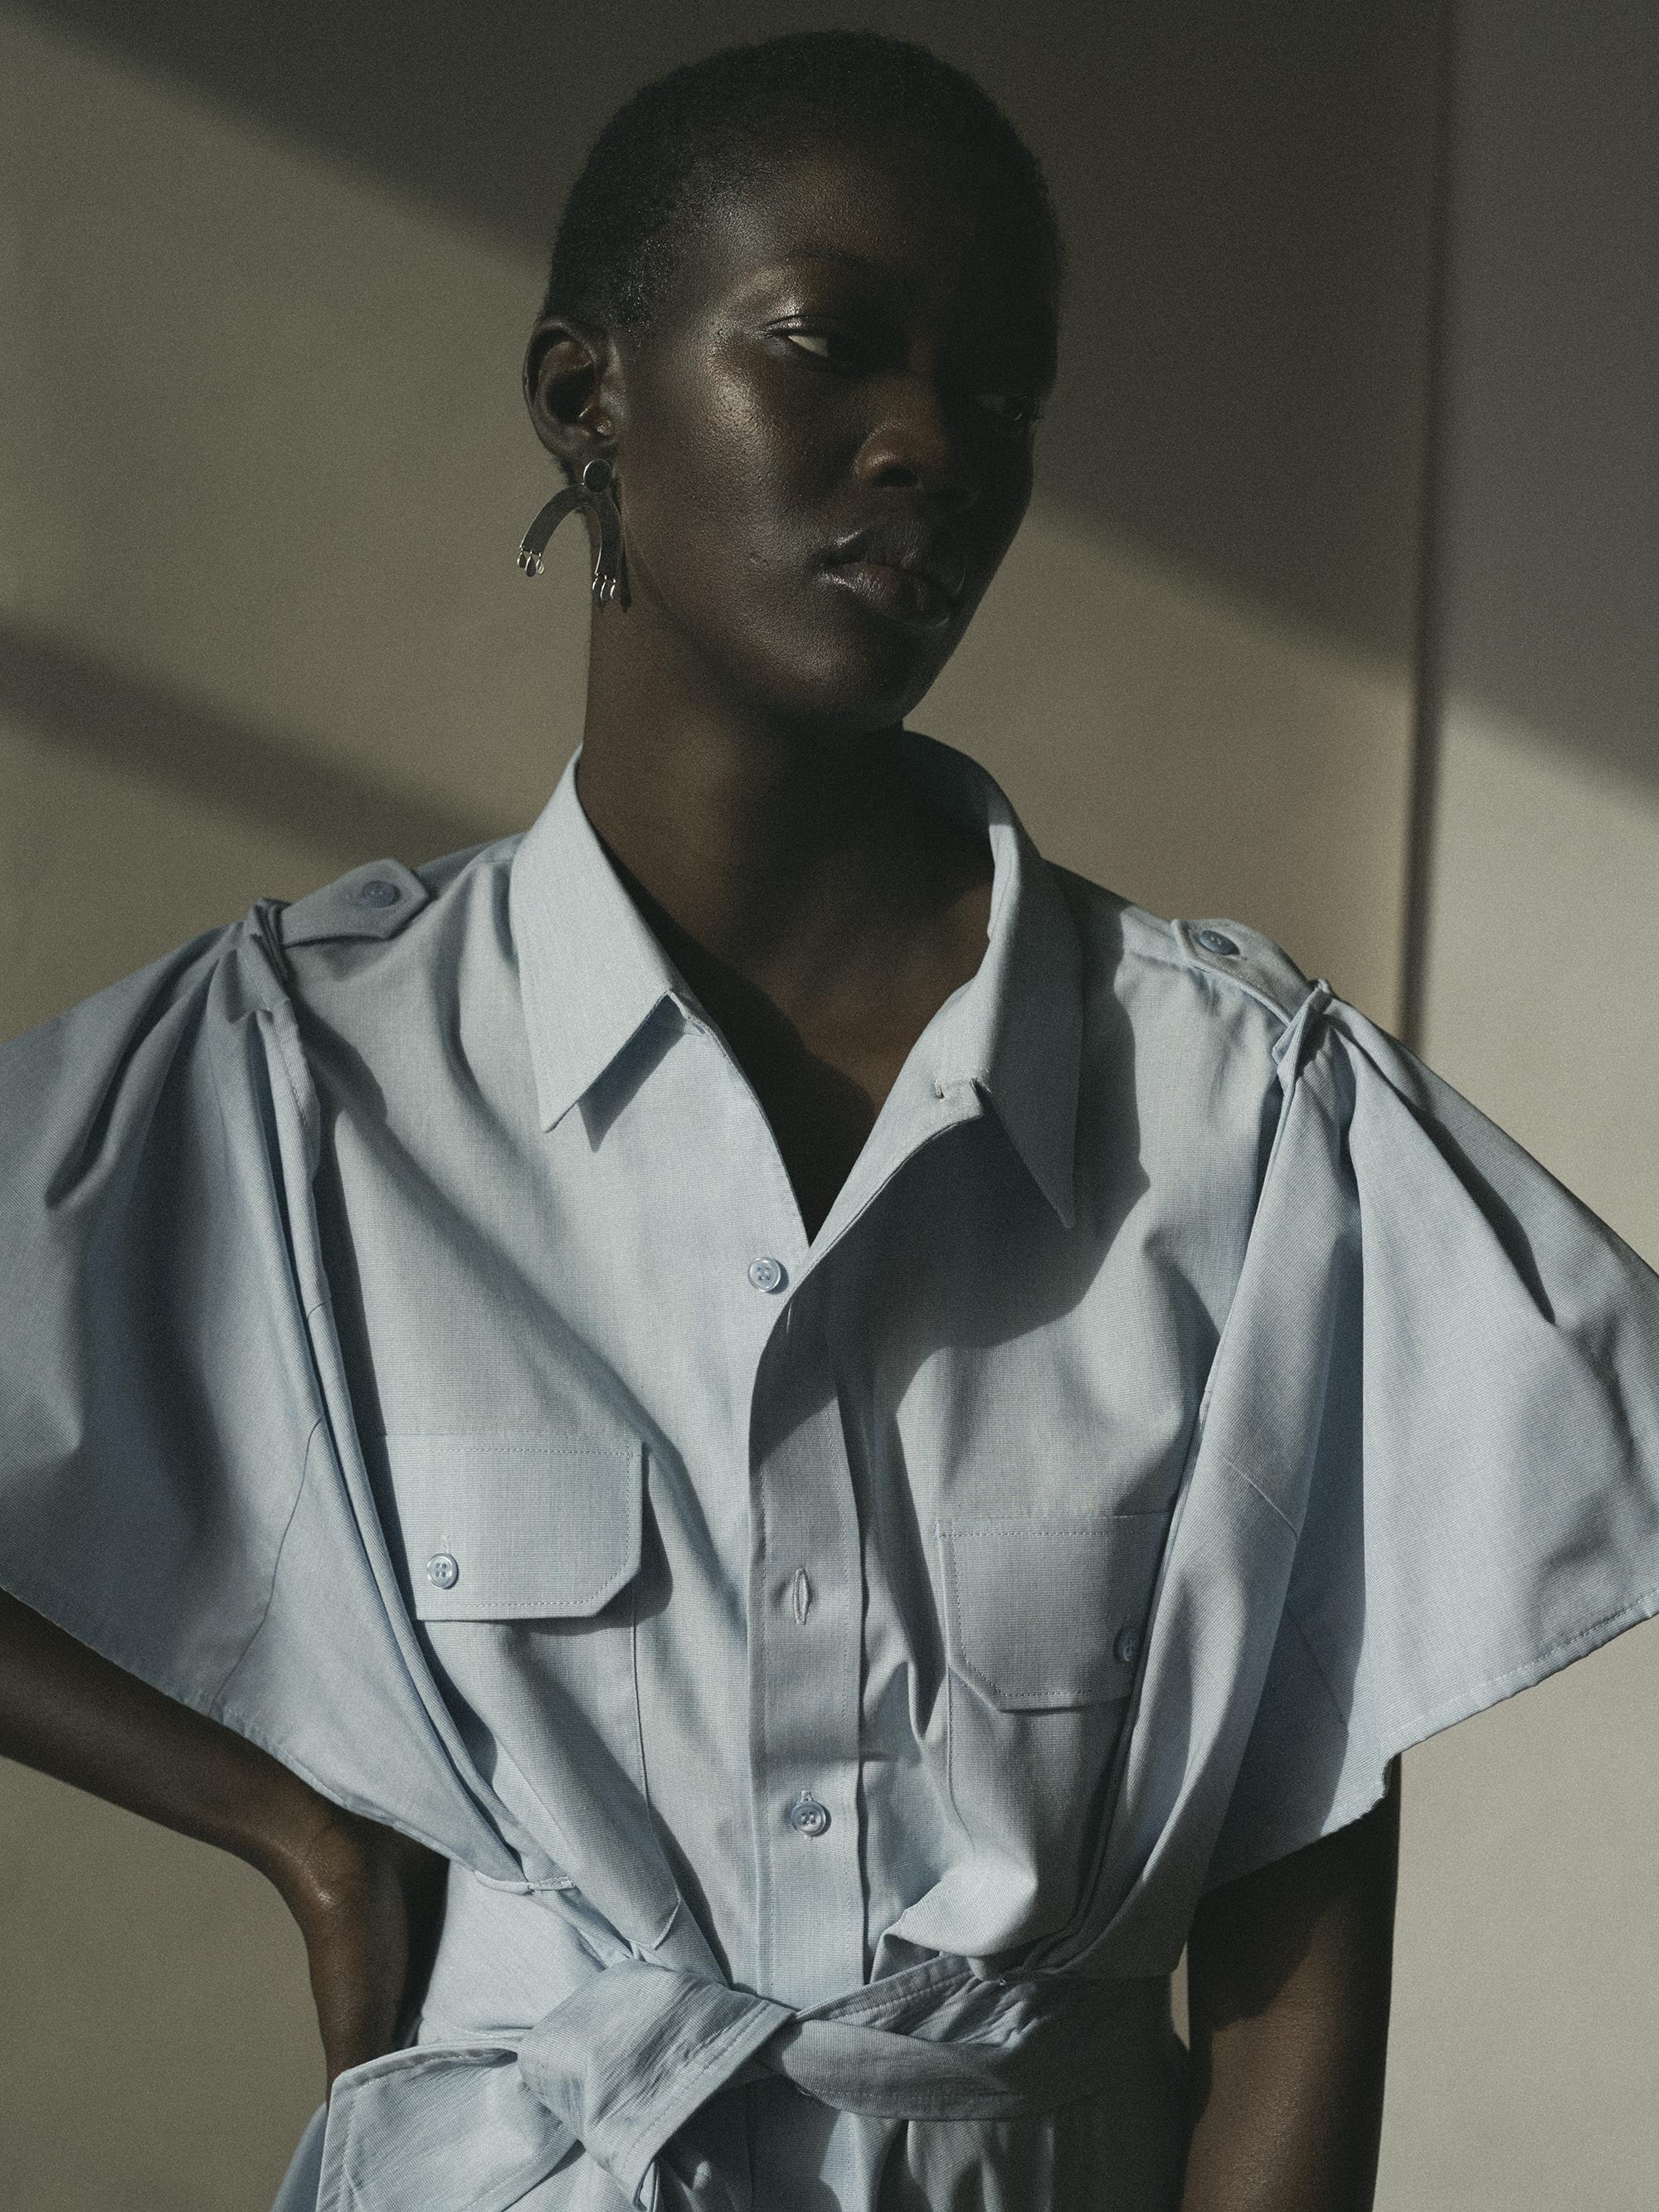 Oversized blouse  MOBENCHELLAL.  Opposite: Shirt  Schuellerdewaal